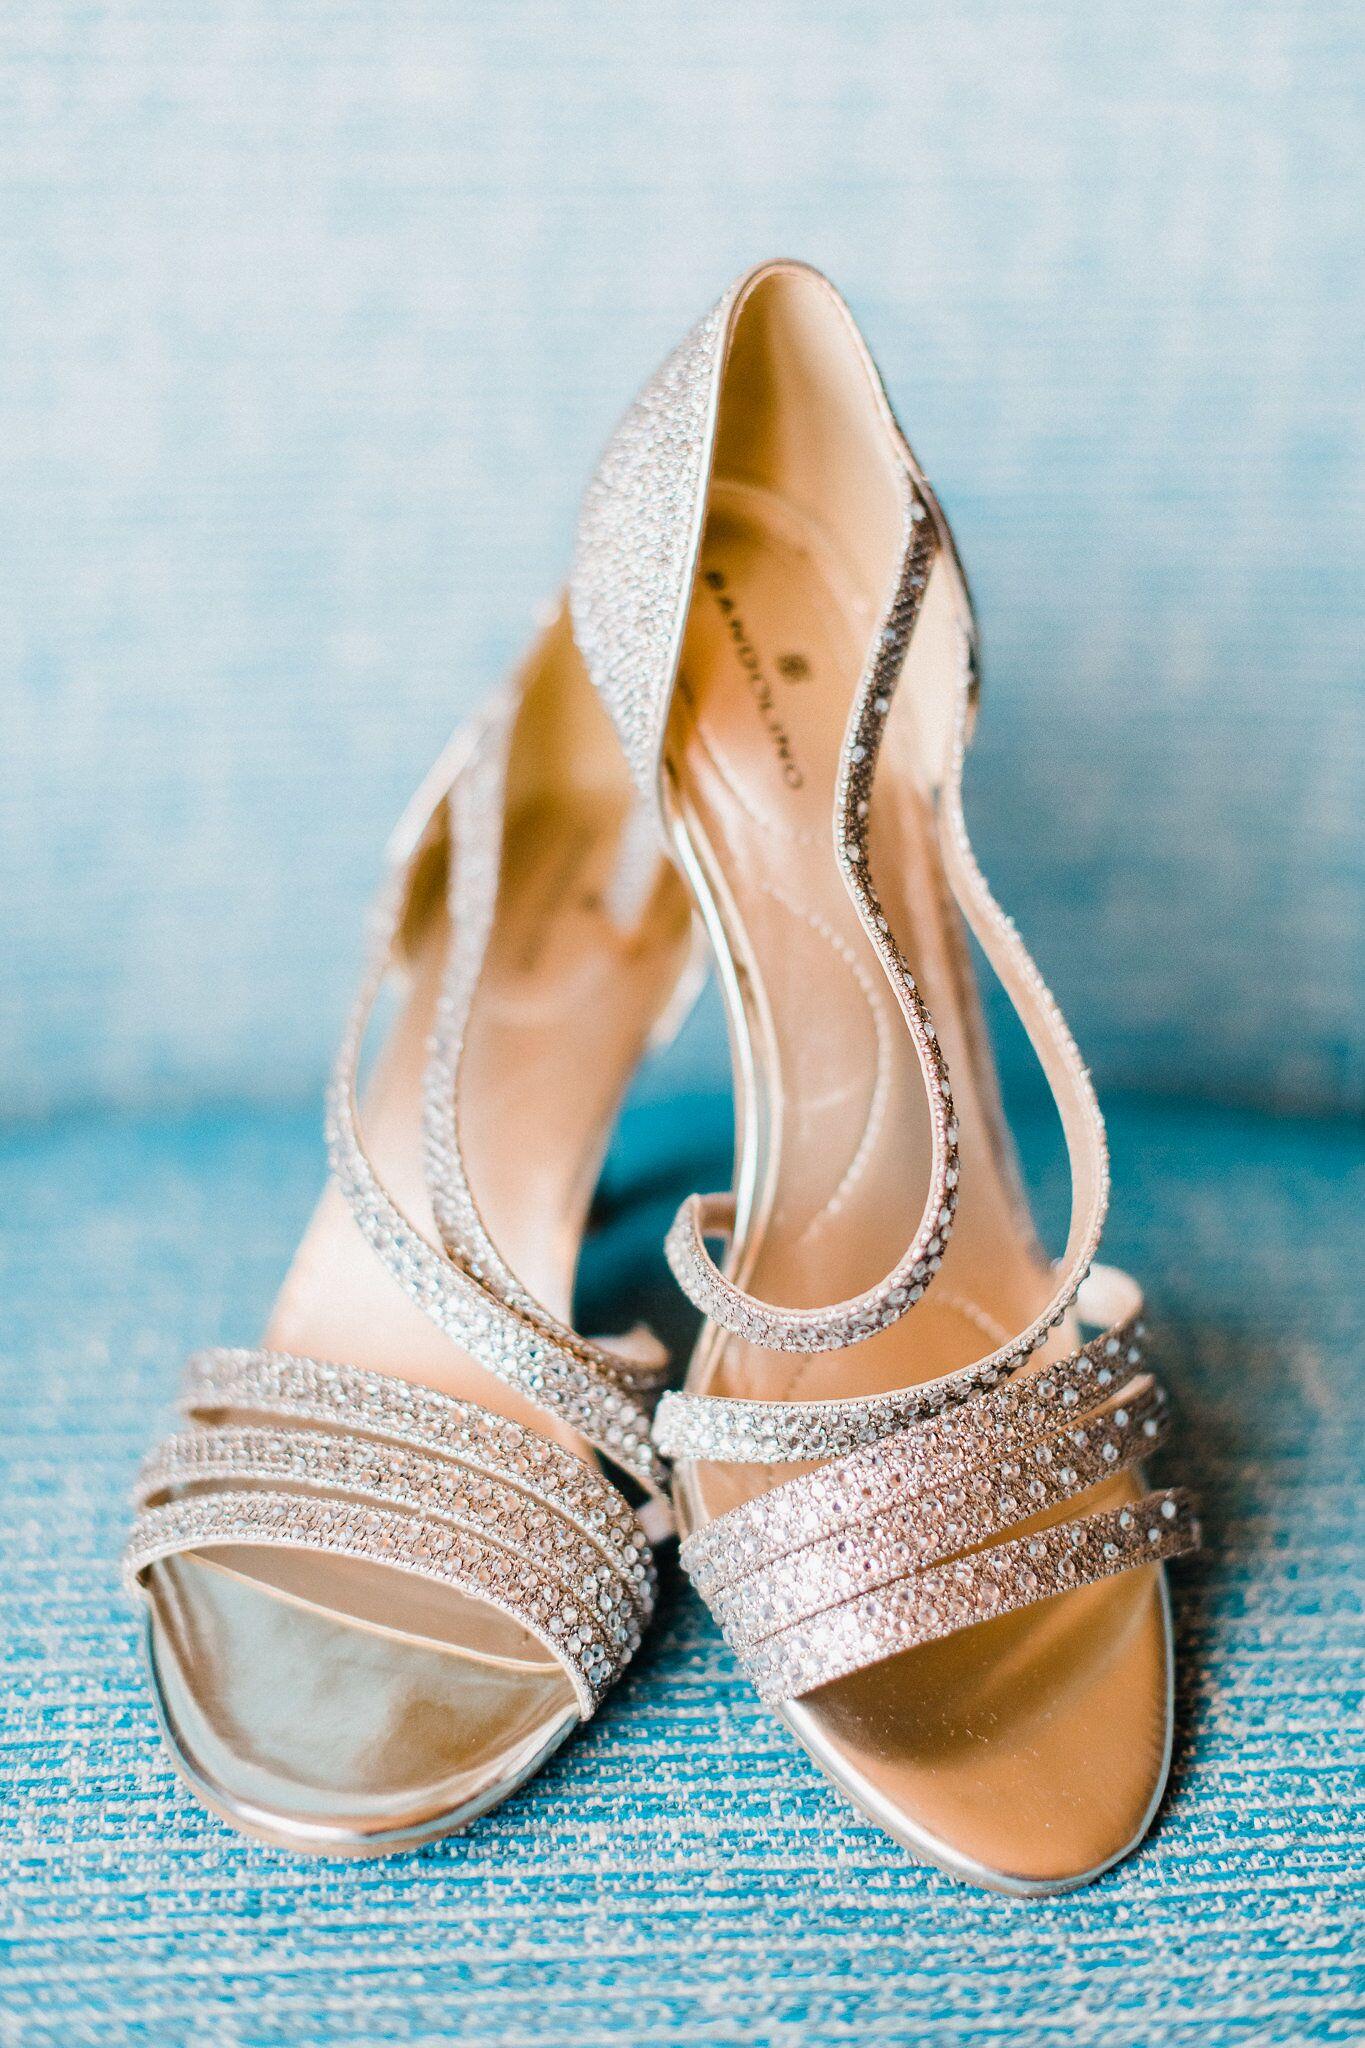 www.santabarbaraweddings.com | Photographer: Grace Kathryn | Venues: Villa & Vine, Santa Barbara Courthouse, Hilton Santa Barbara Resort | Coordination: Burlap & Bordeaux | Bridal Shoes